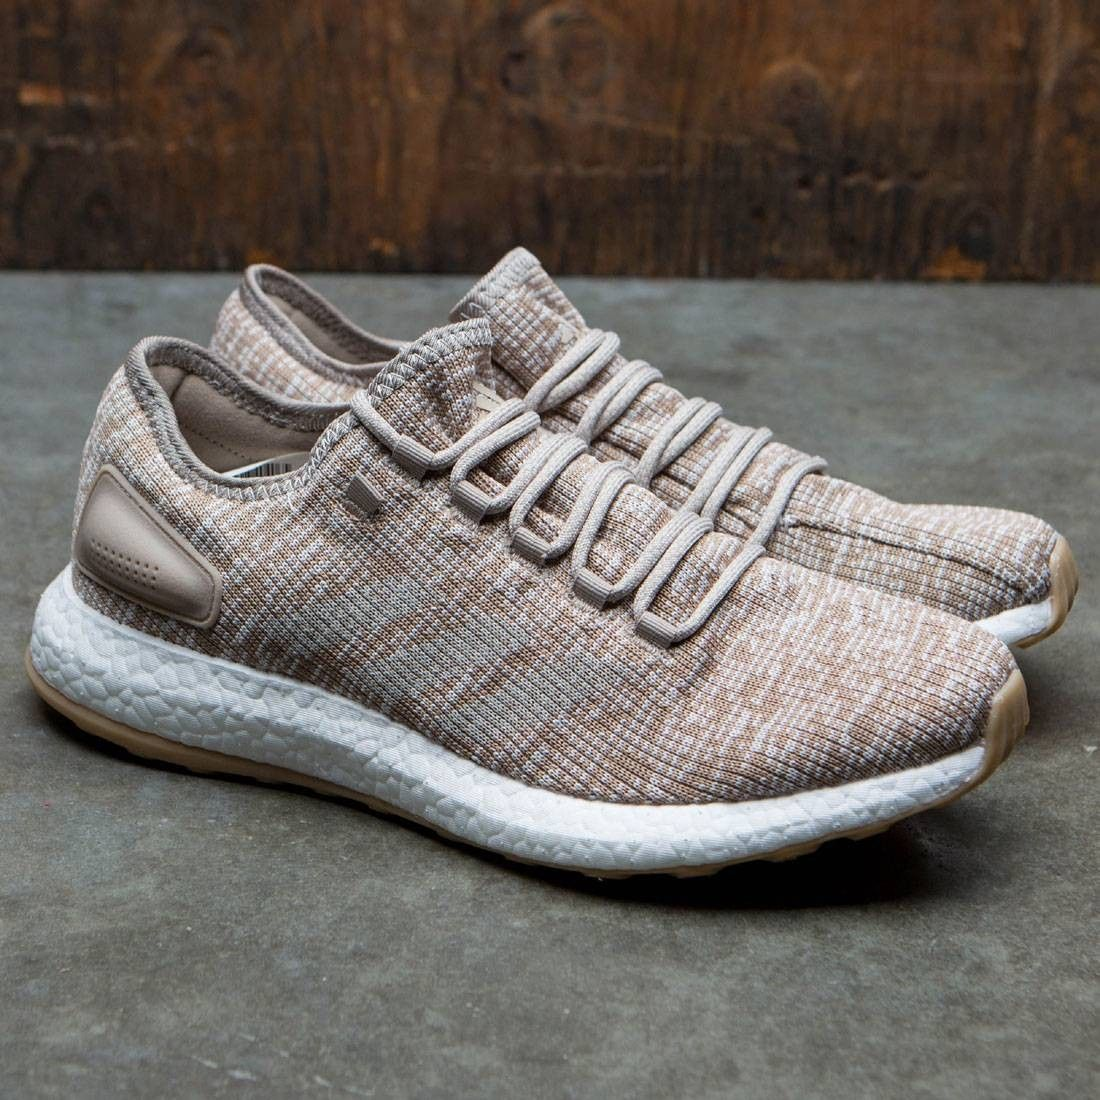 Adidas Men PureBOOST (khaki / clear